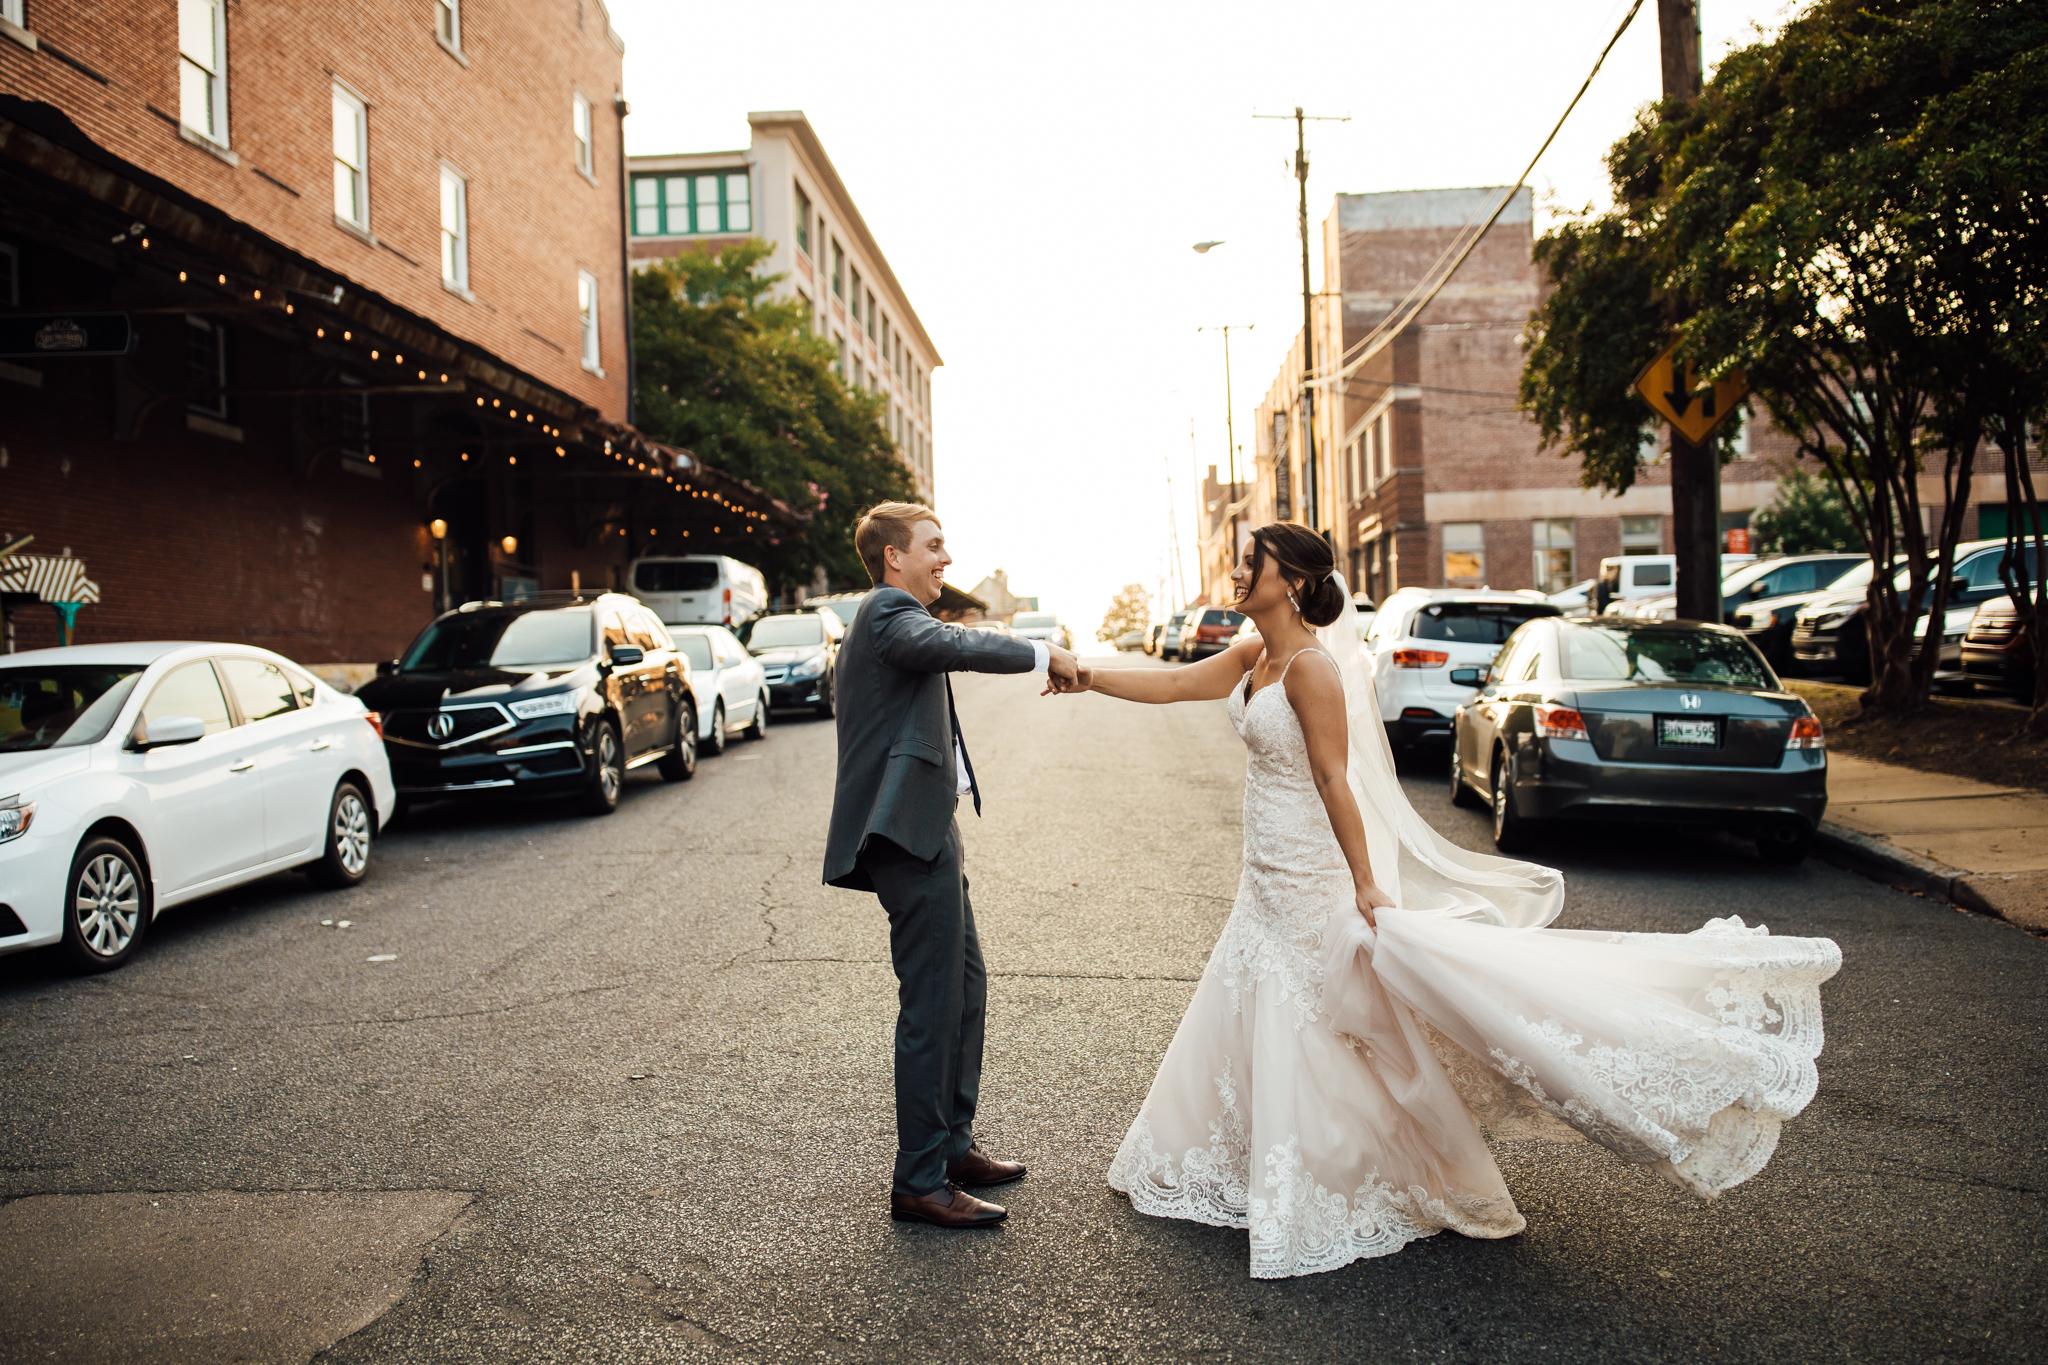 409smain-downtown-memphis-wedding-venue-thewarmtharoundyou (119 of 243).jpg